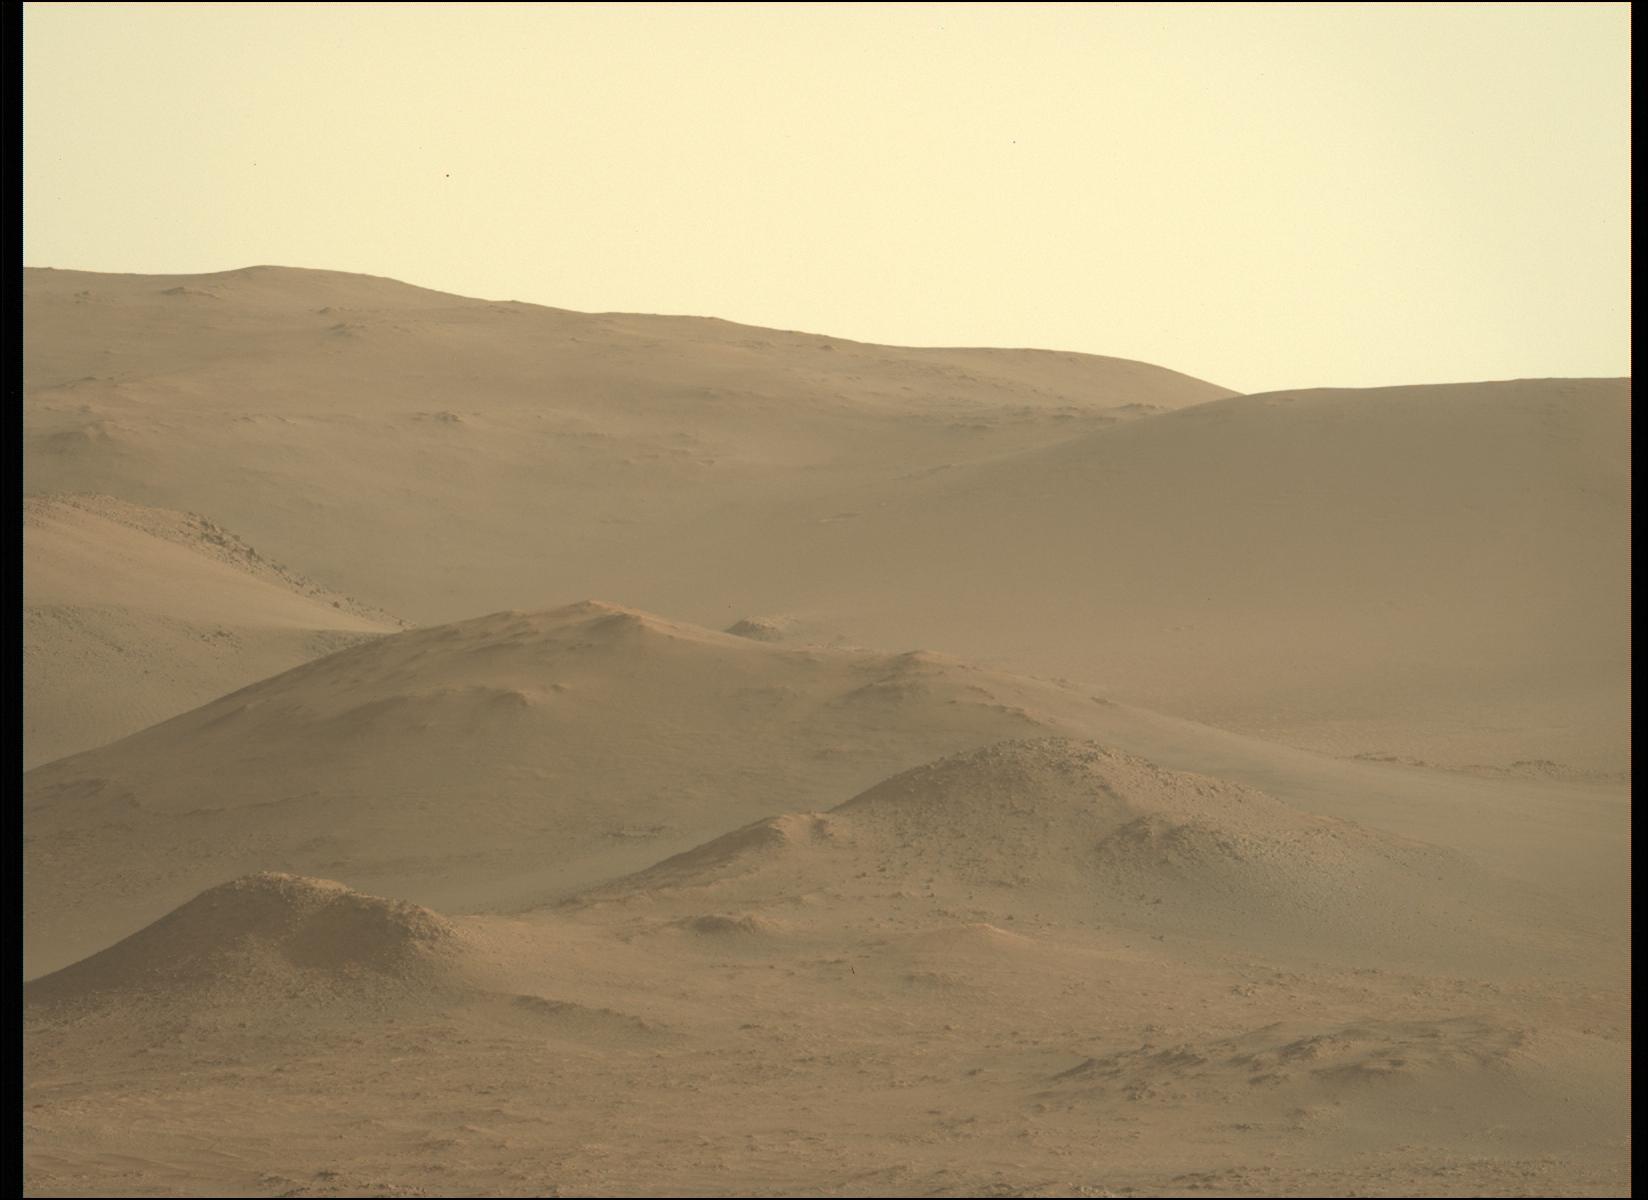 Mars_Perseverance_ZL0_0128_0678318072_318EBY_N0041878ZCAM08129_1100LMJ.png